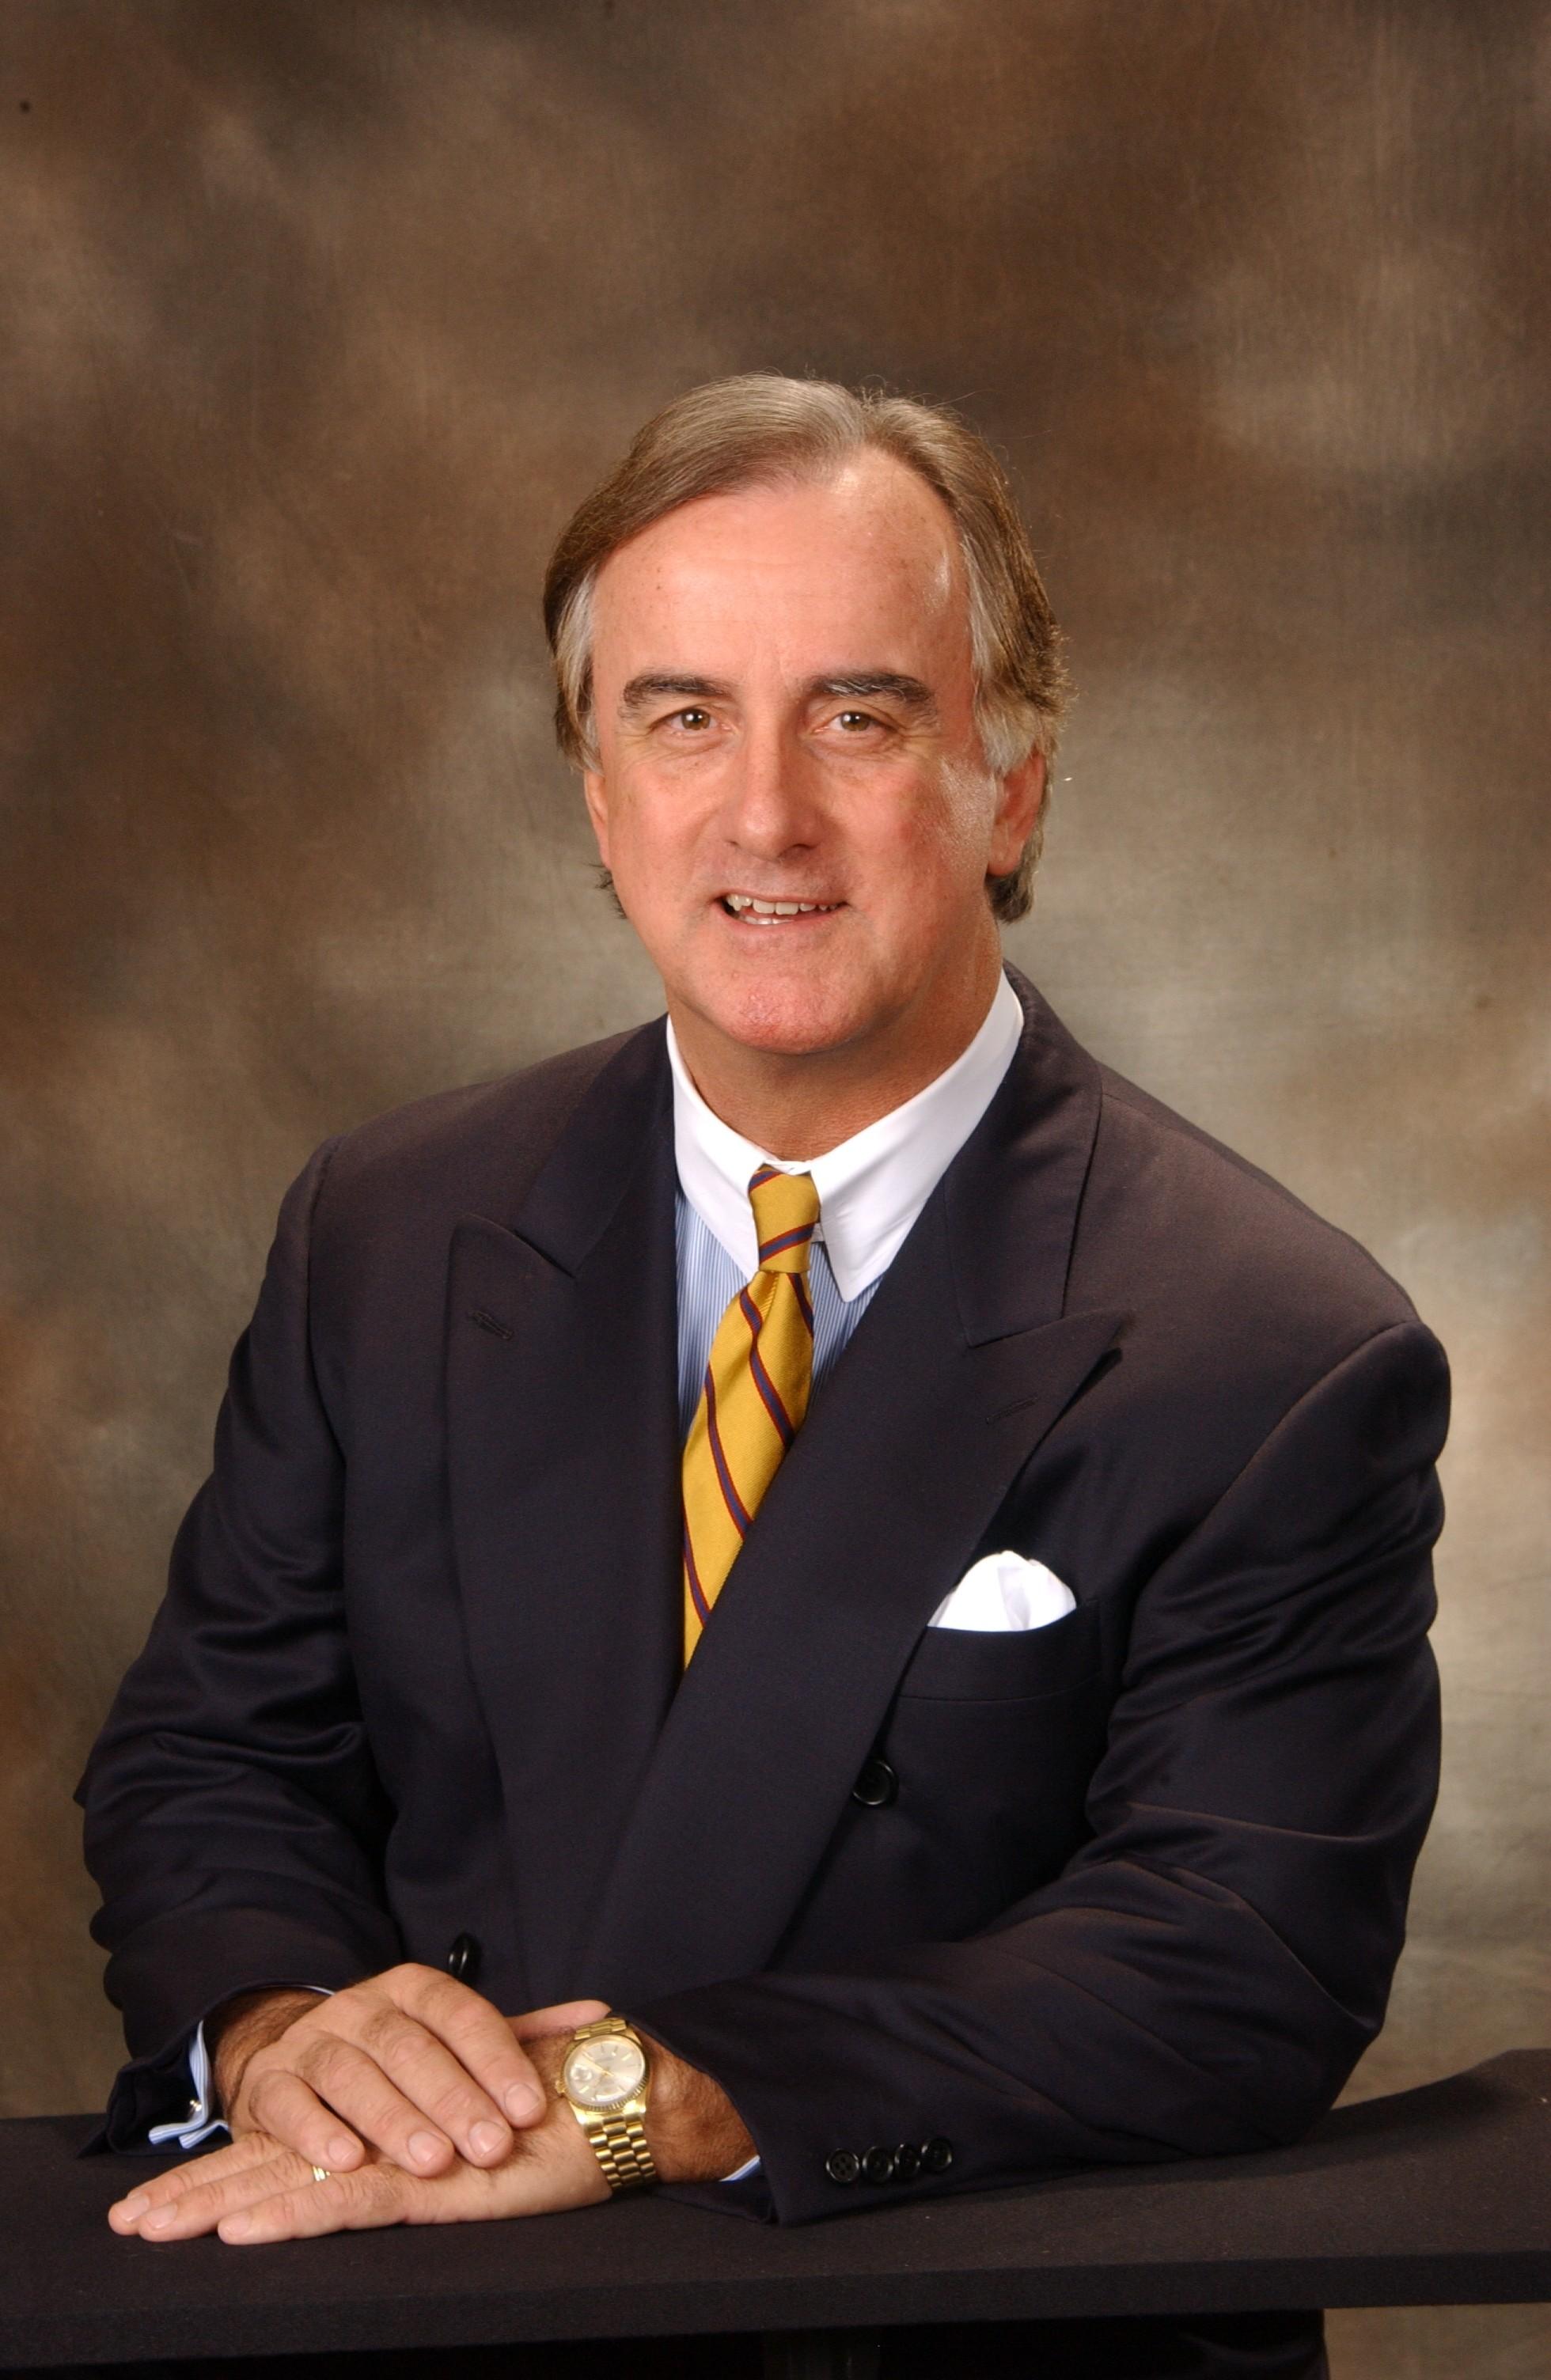 CardioNet, Inc. (NASDAQ: BEAT) CEO Interview with Randy Thurman